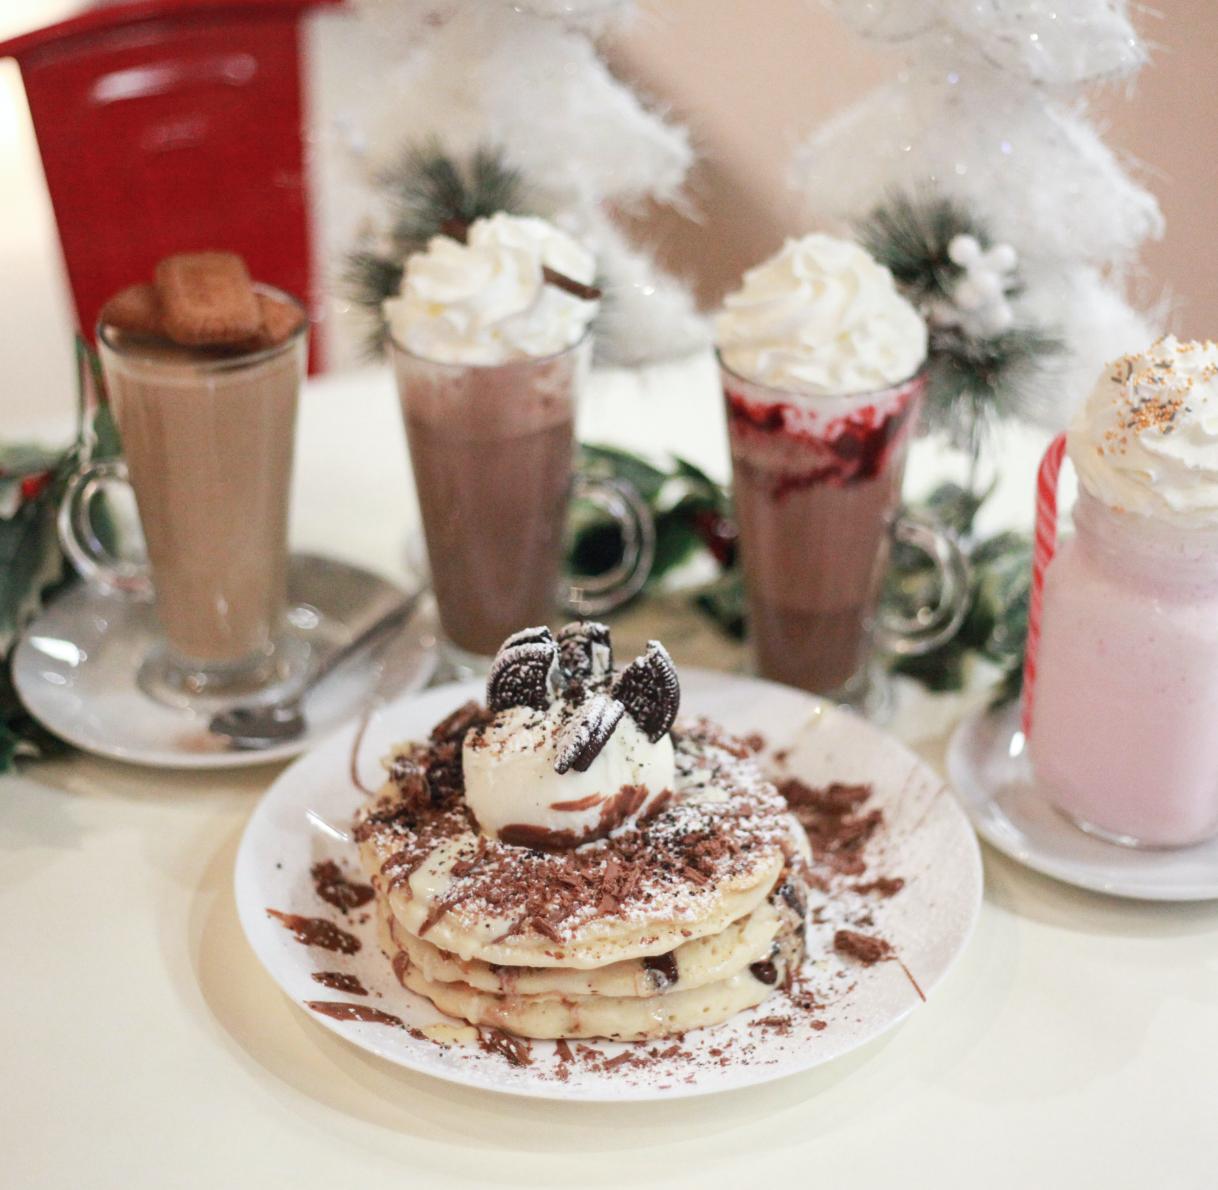 STAKKS december pancakes southampton